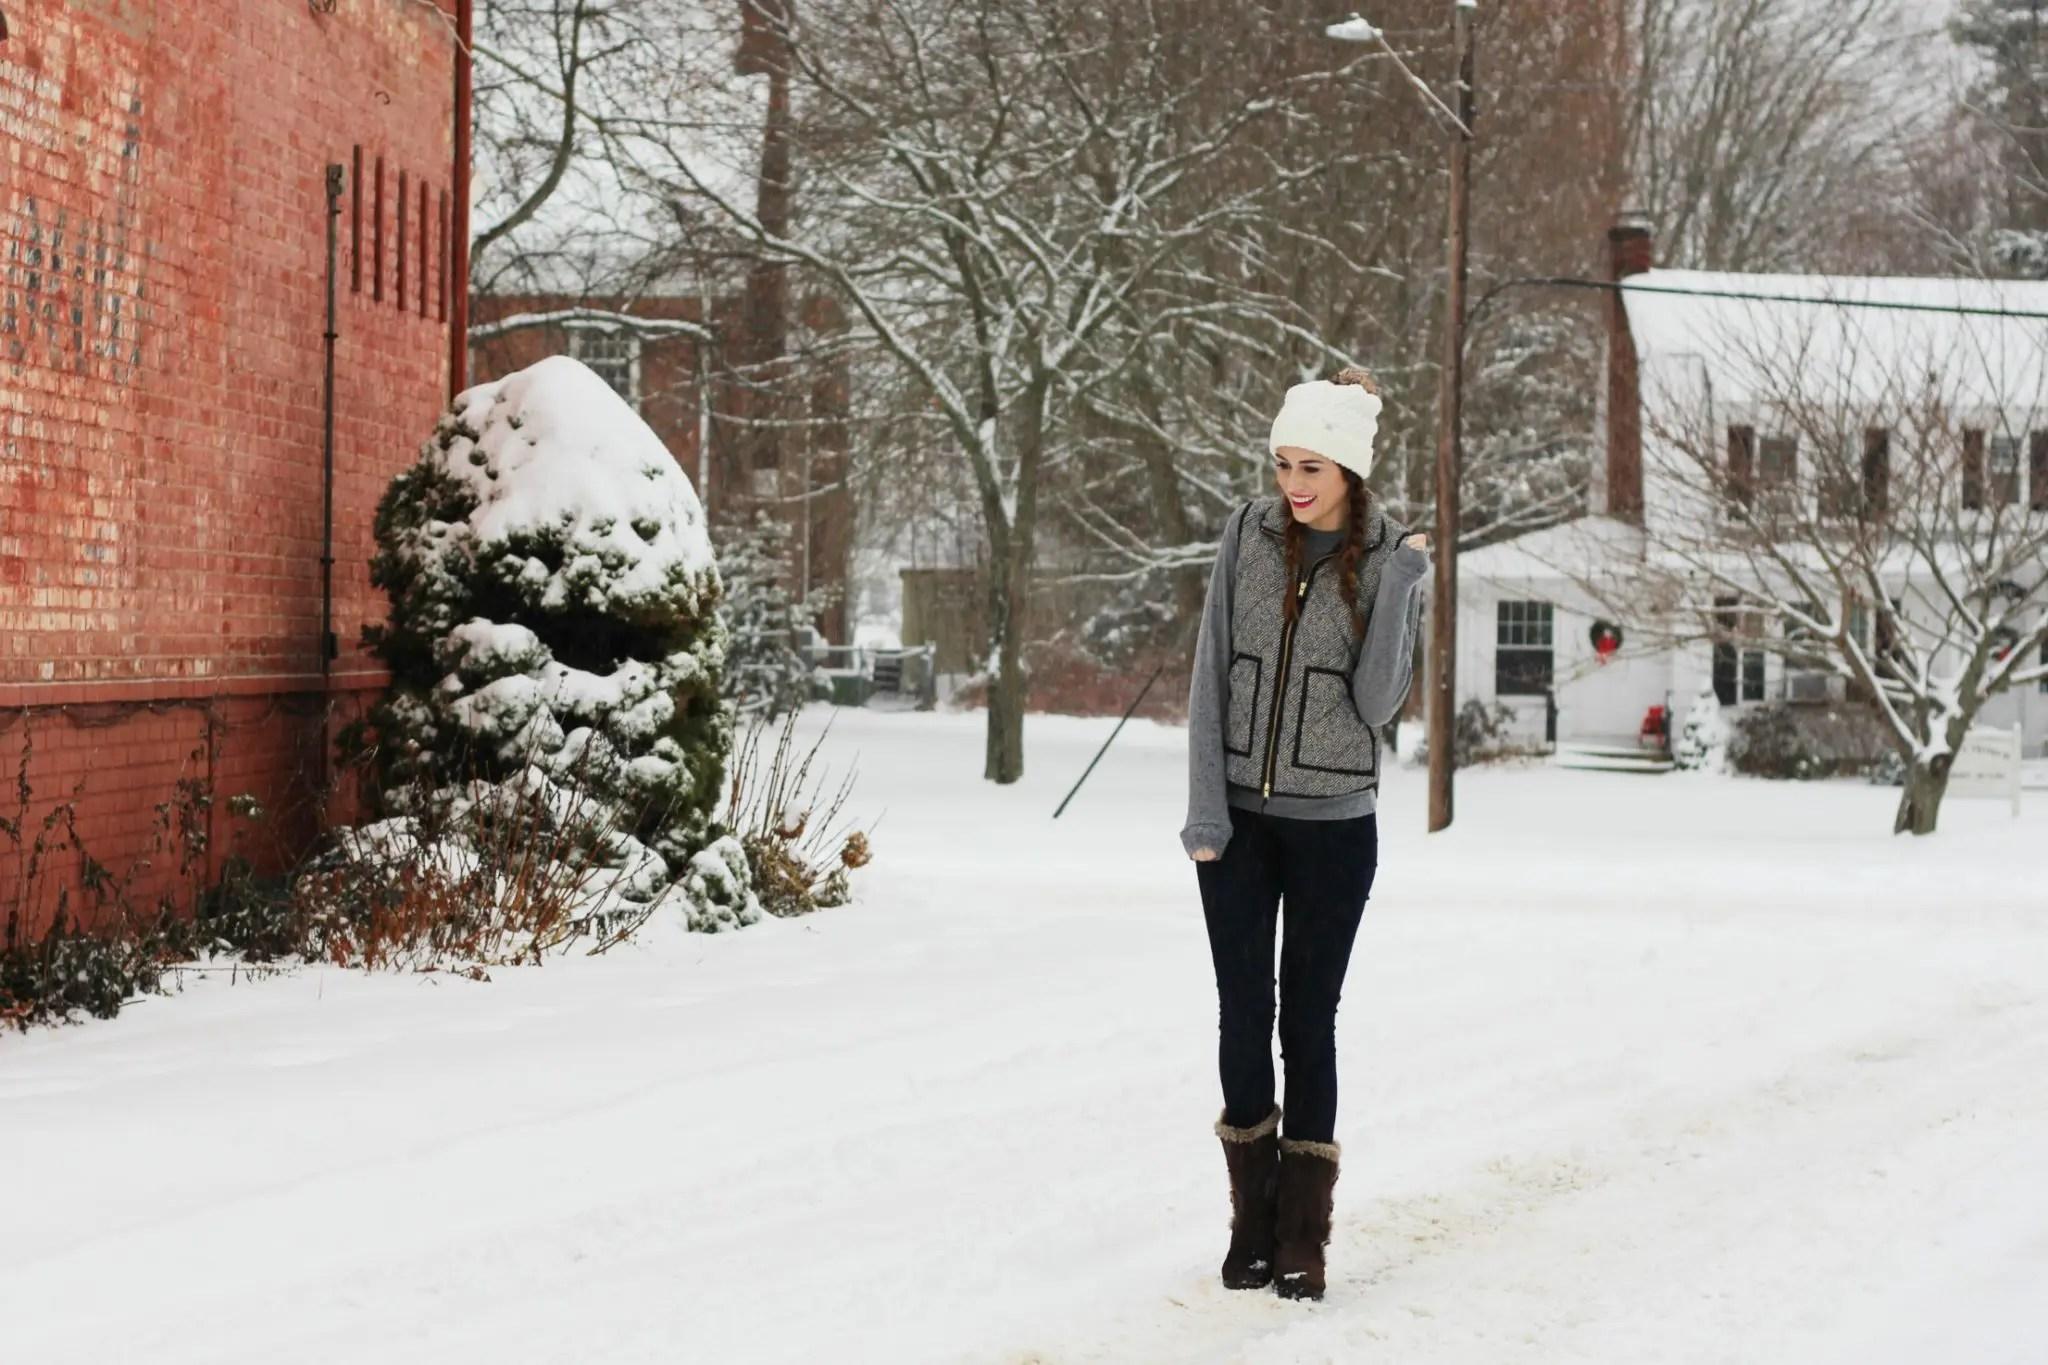 snowy-saturday-2